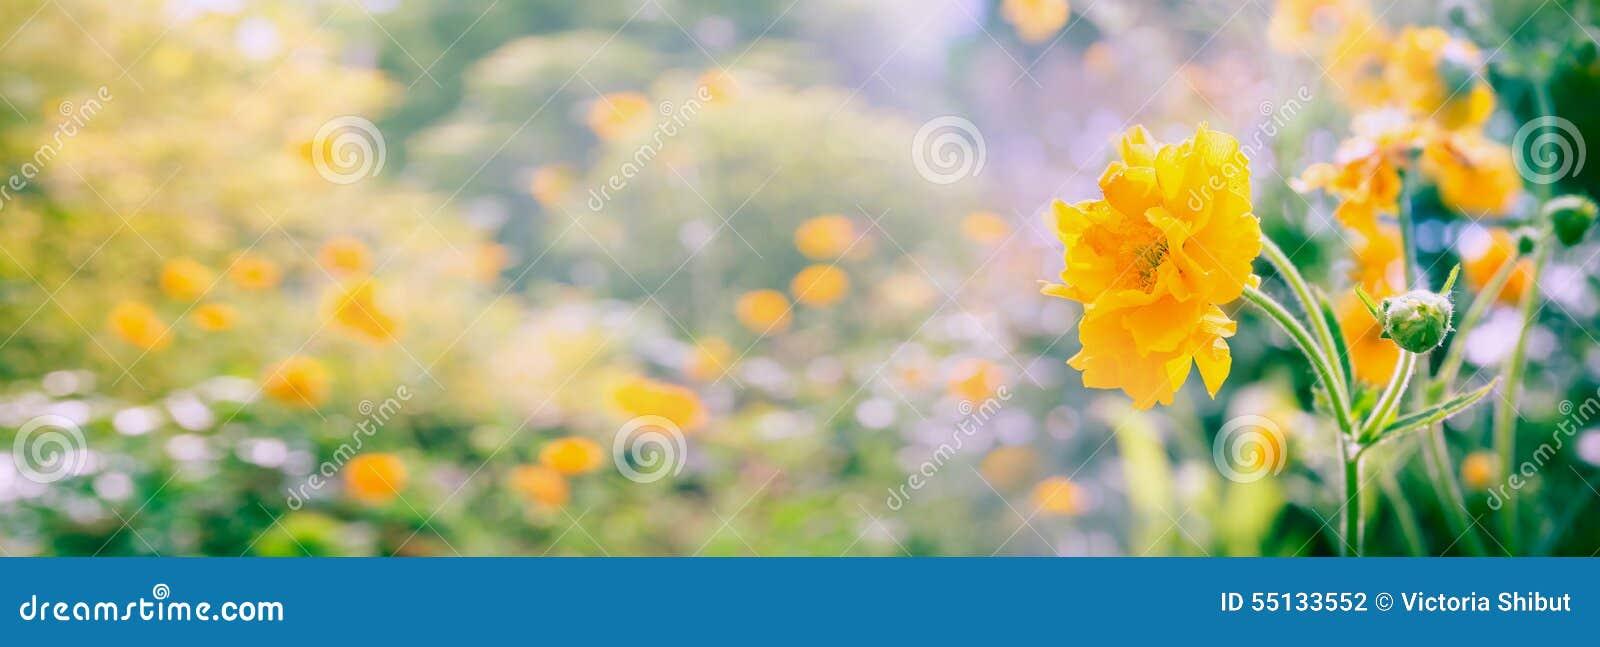 Yellow Geum flowers panorama on blurred summer garden or park background, banner